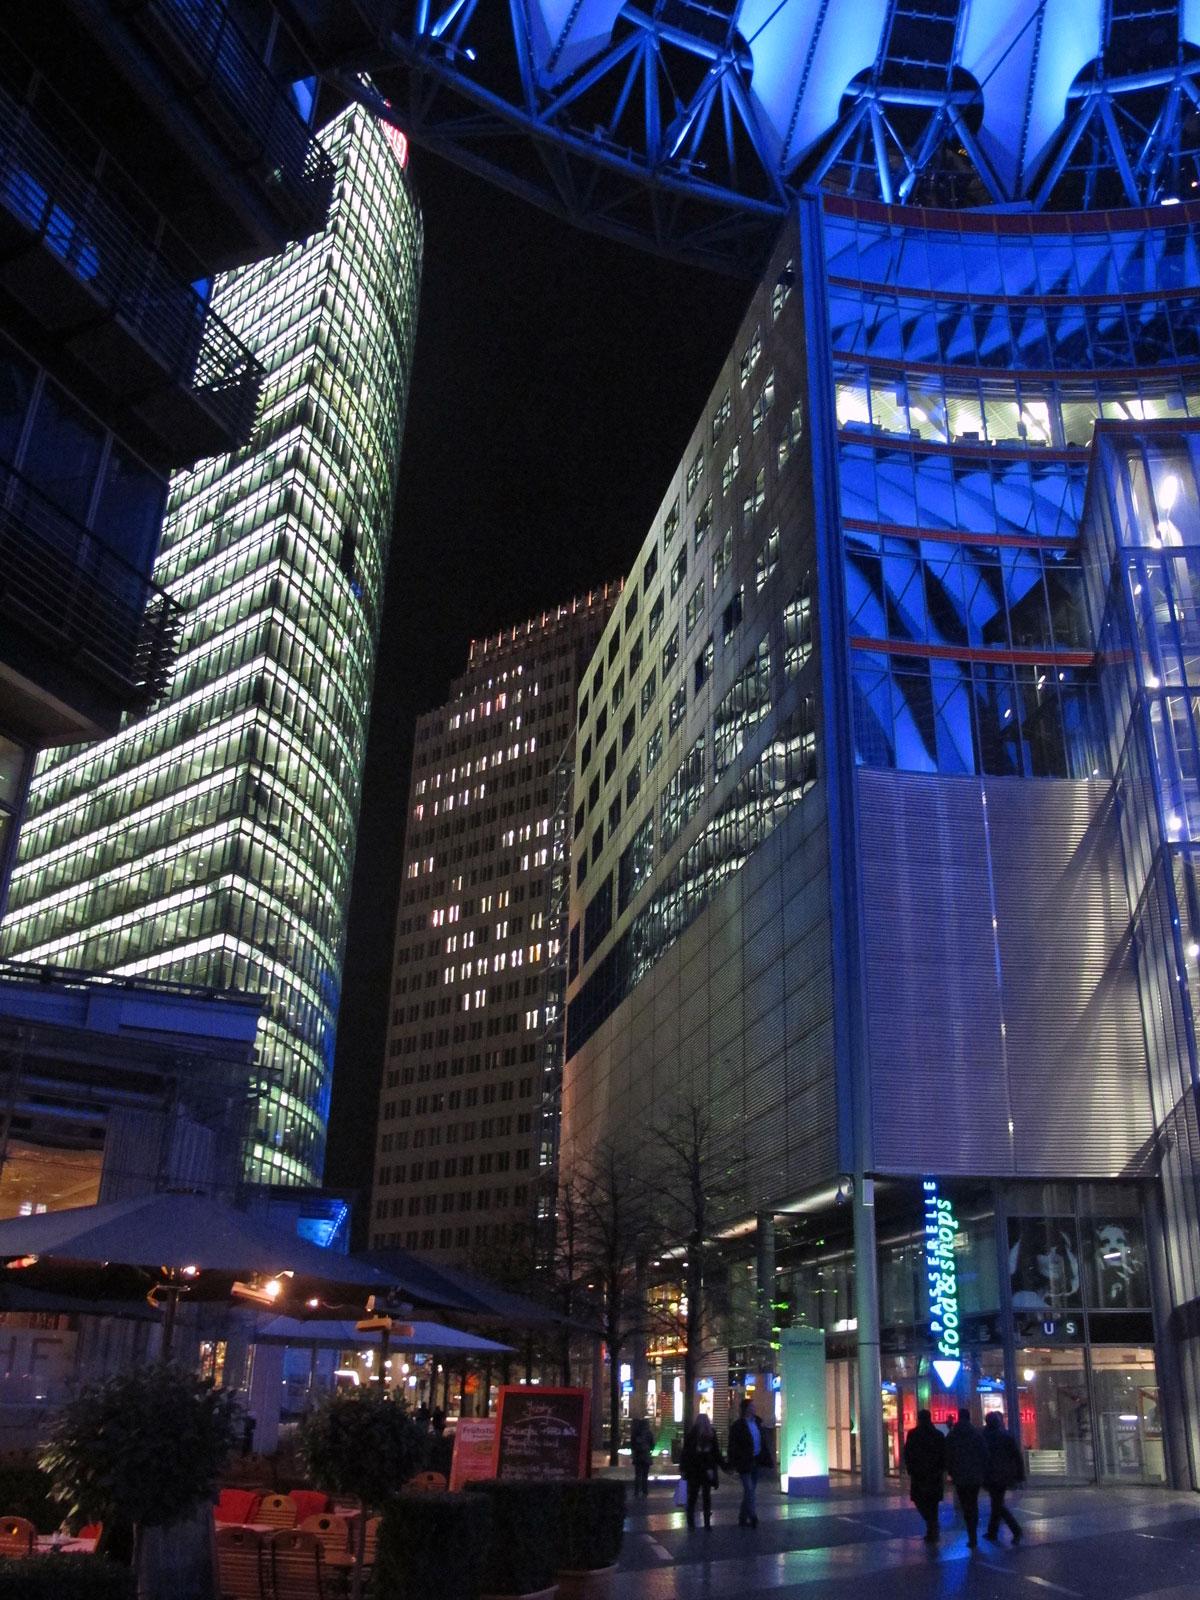 Potsdamer Platz from the Sony Center